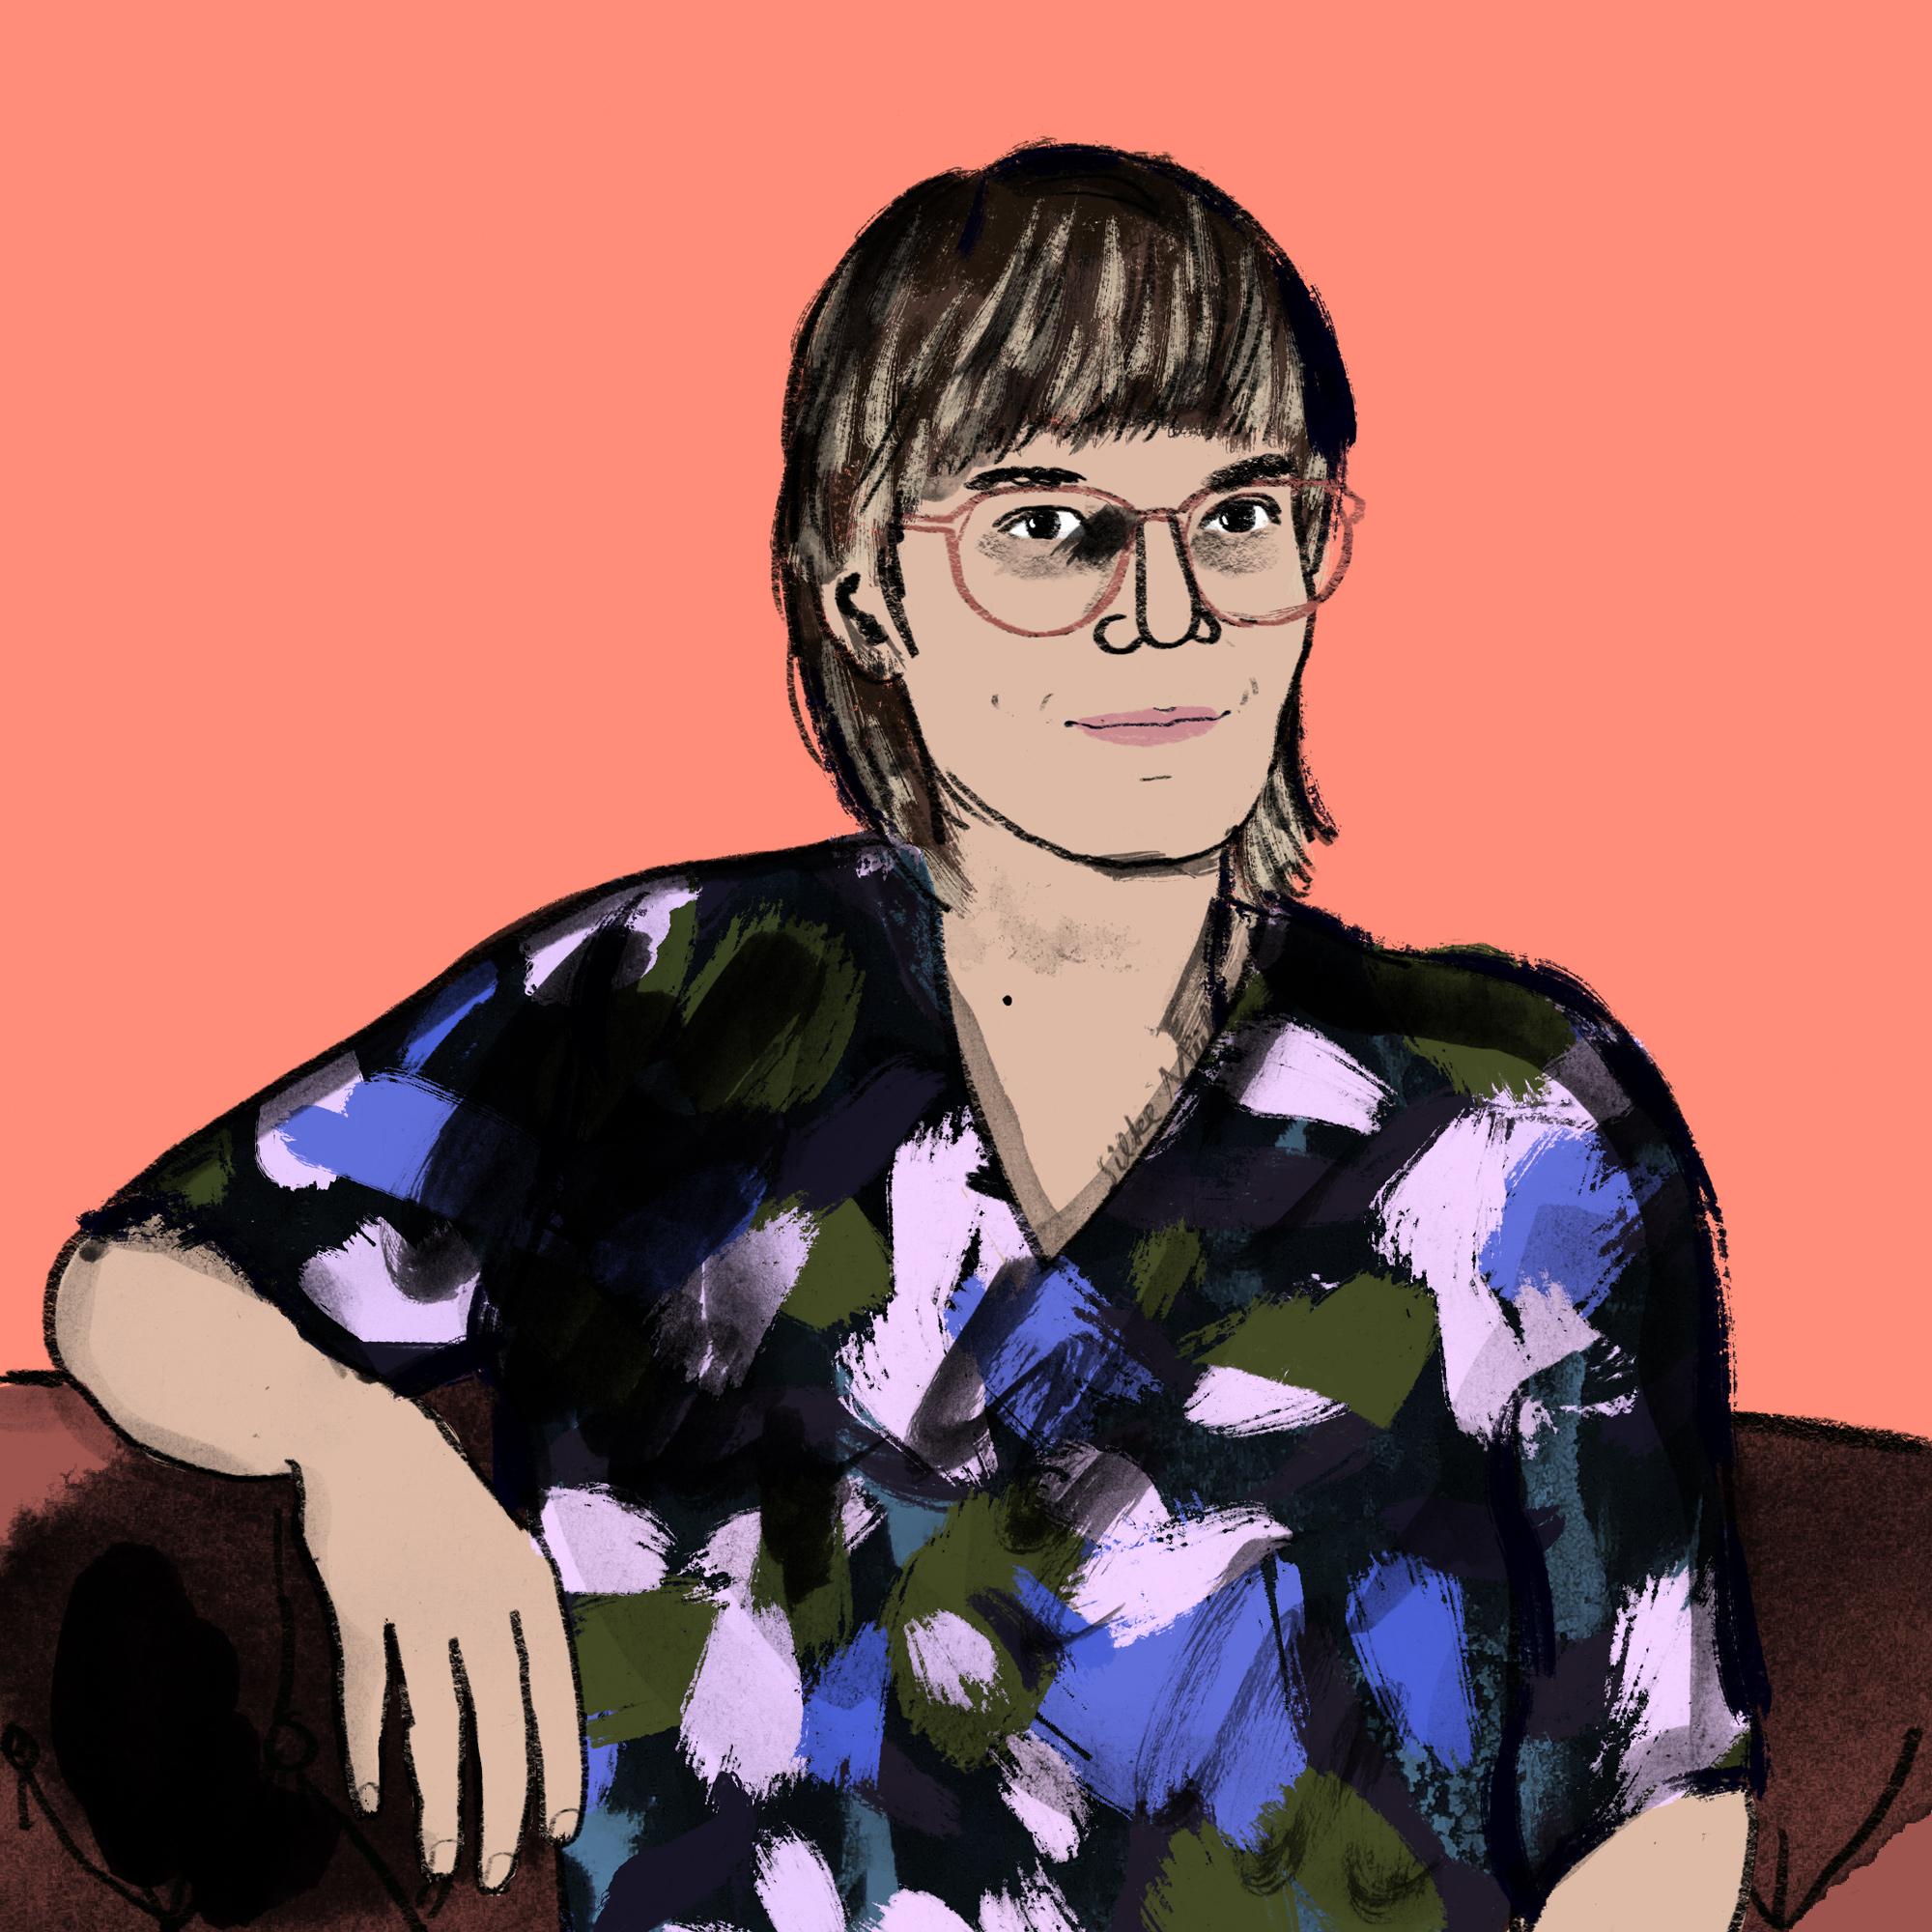 Svenja Gräfen für Große Töchter Podcast | Beatrice Frasl | Illustration: Silke Müller